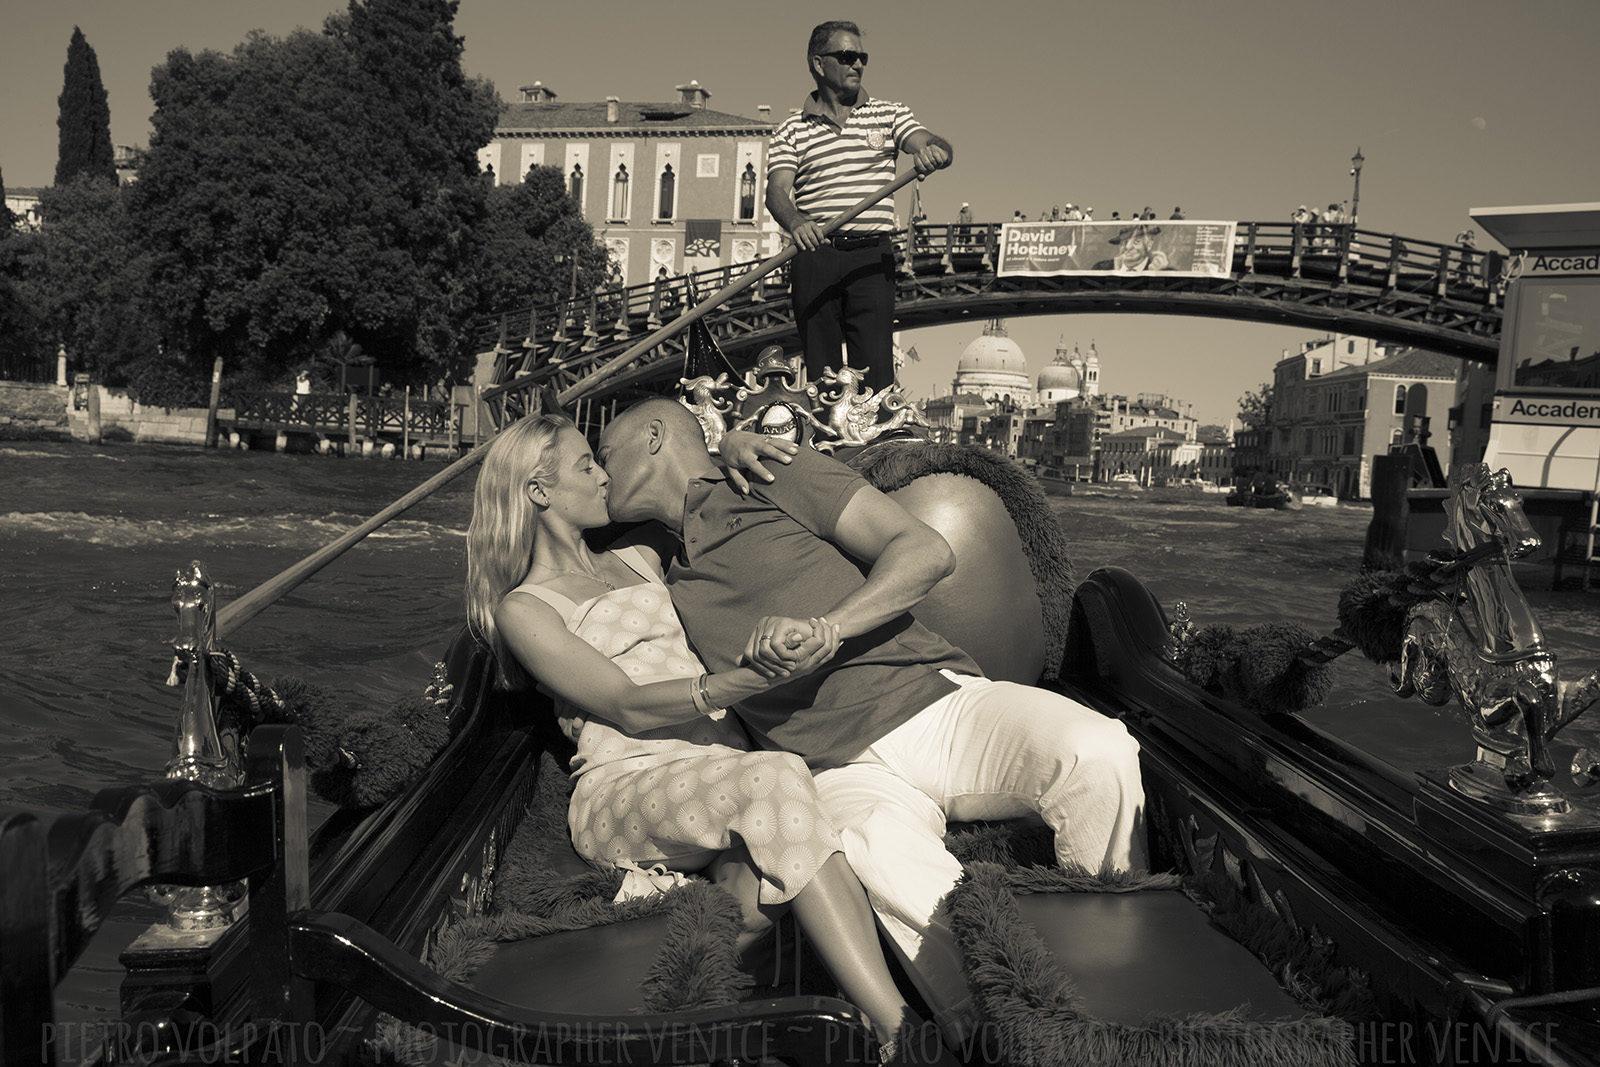 honeymoon photographer venice photo walk